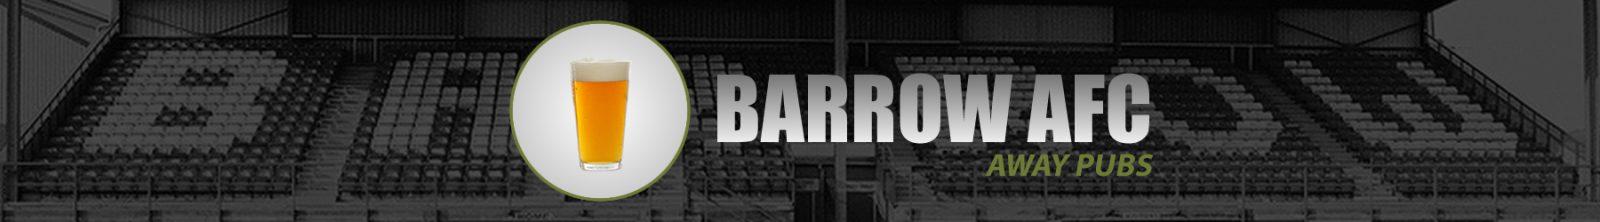 Barrow AFC Away Pubs